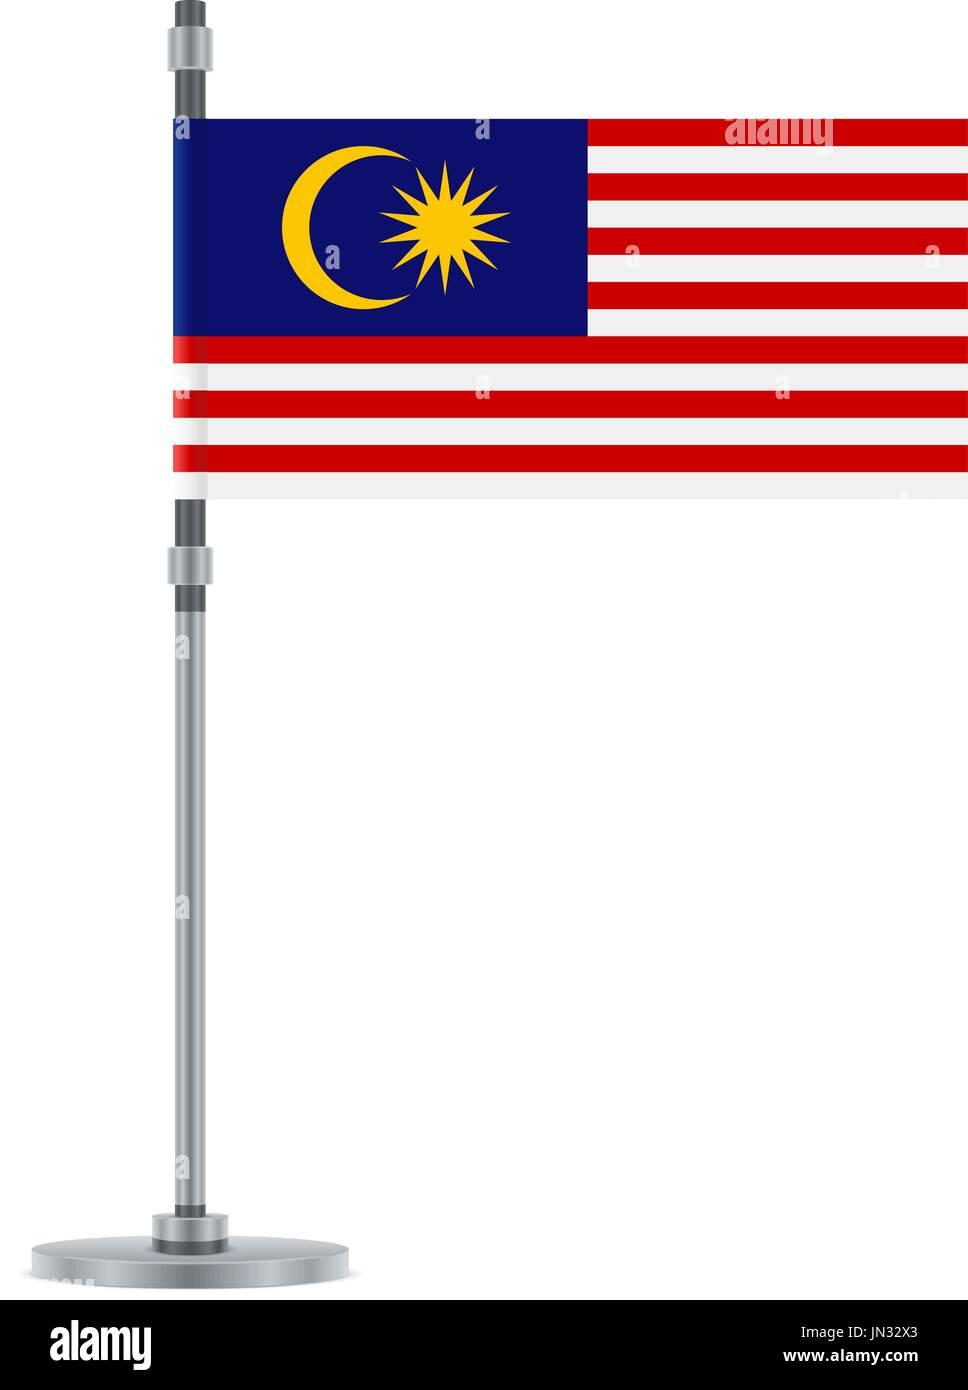 Flag design  Malaysian flag on the metallic pole  Isolated template